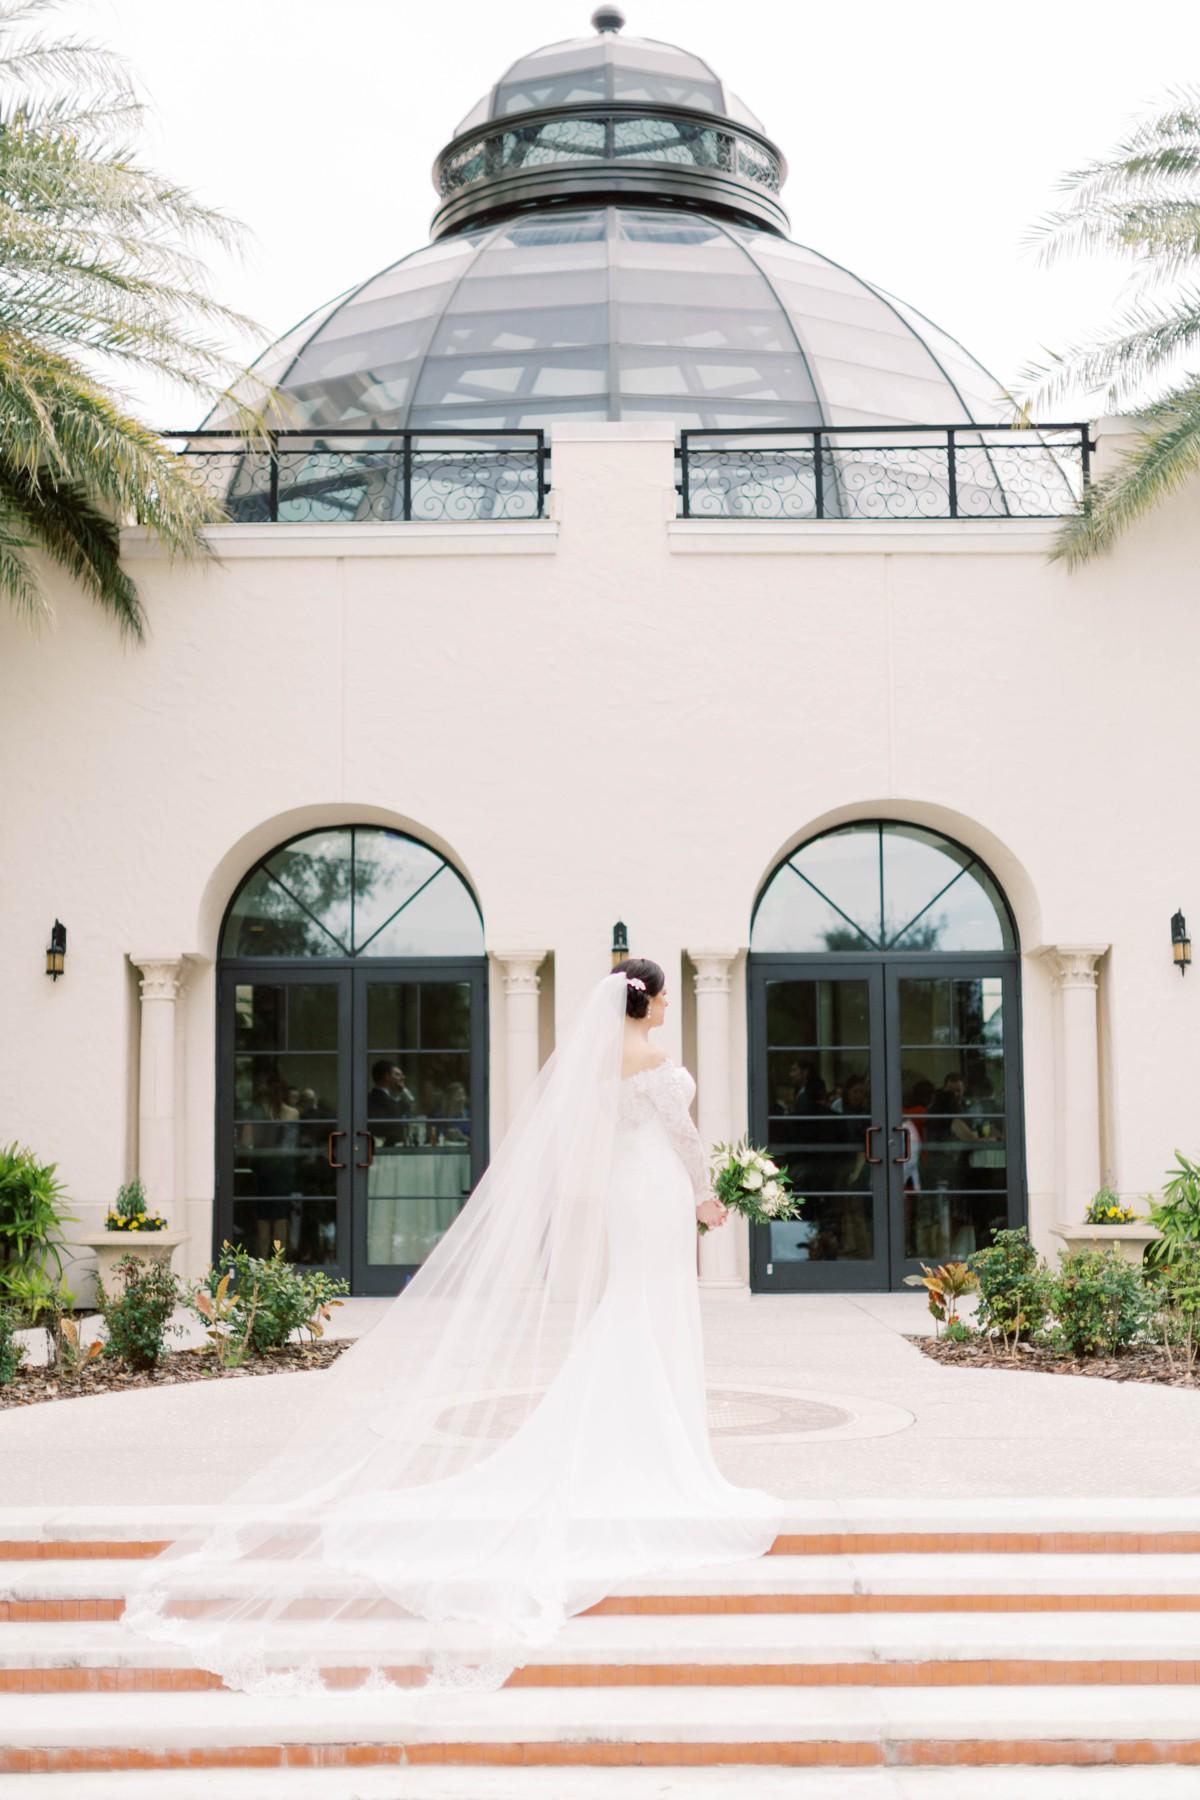 Alfond-Inn-Wedding-Winter-Park-Wedding-Photographer-Chantell-Rae-Photography_0067.jpg